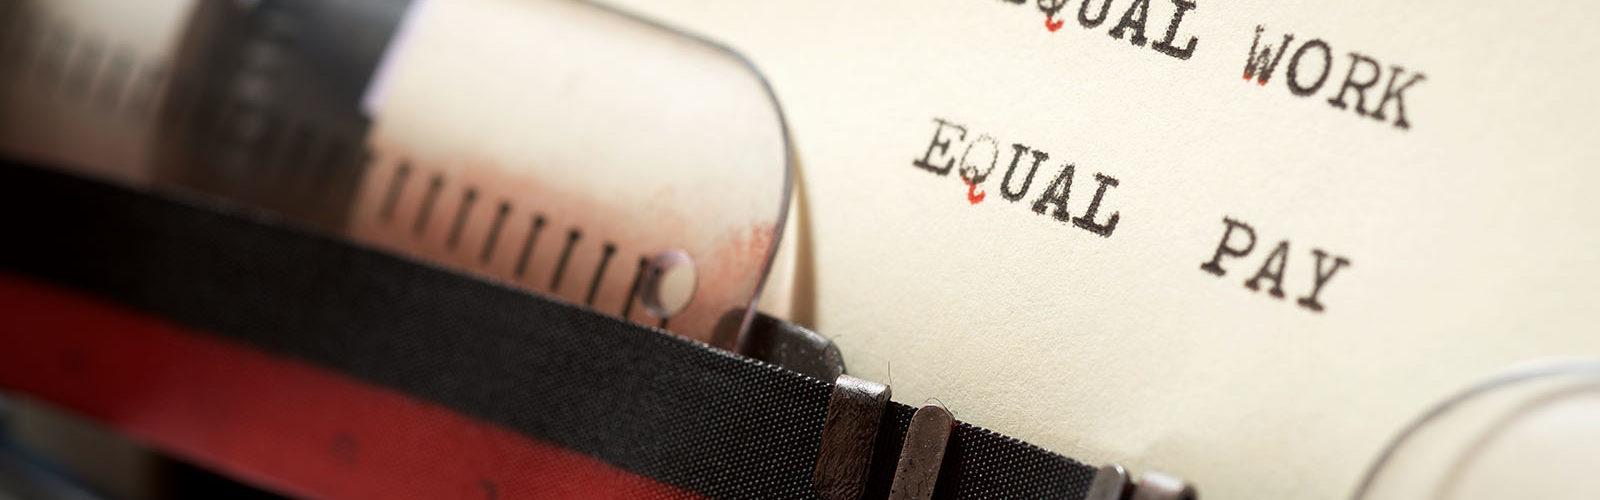 gender equality on typewriter - 392871590 - web.jpg